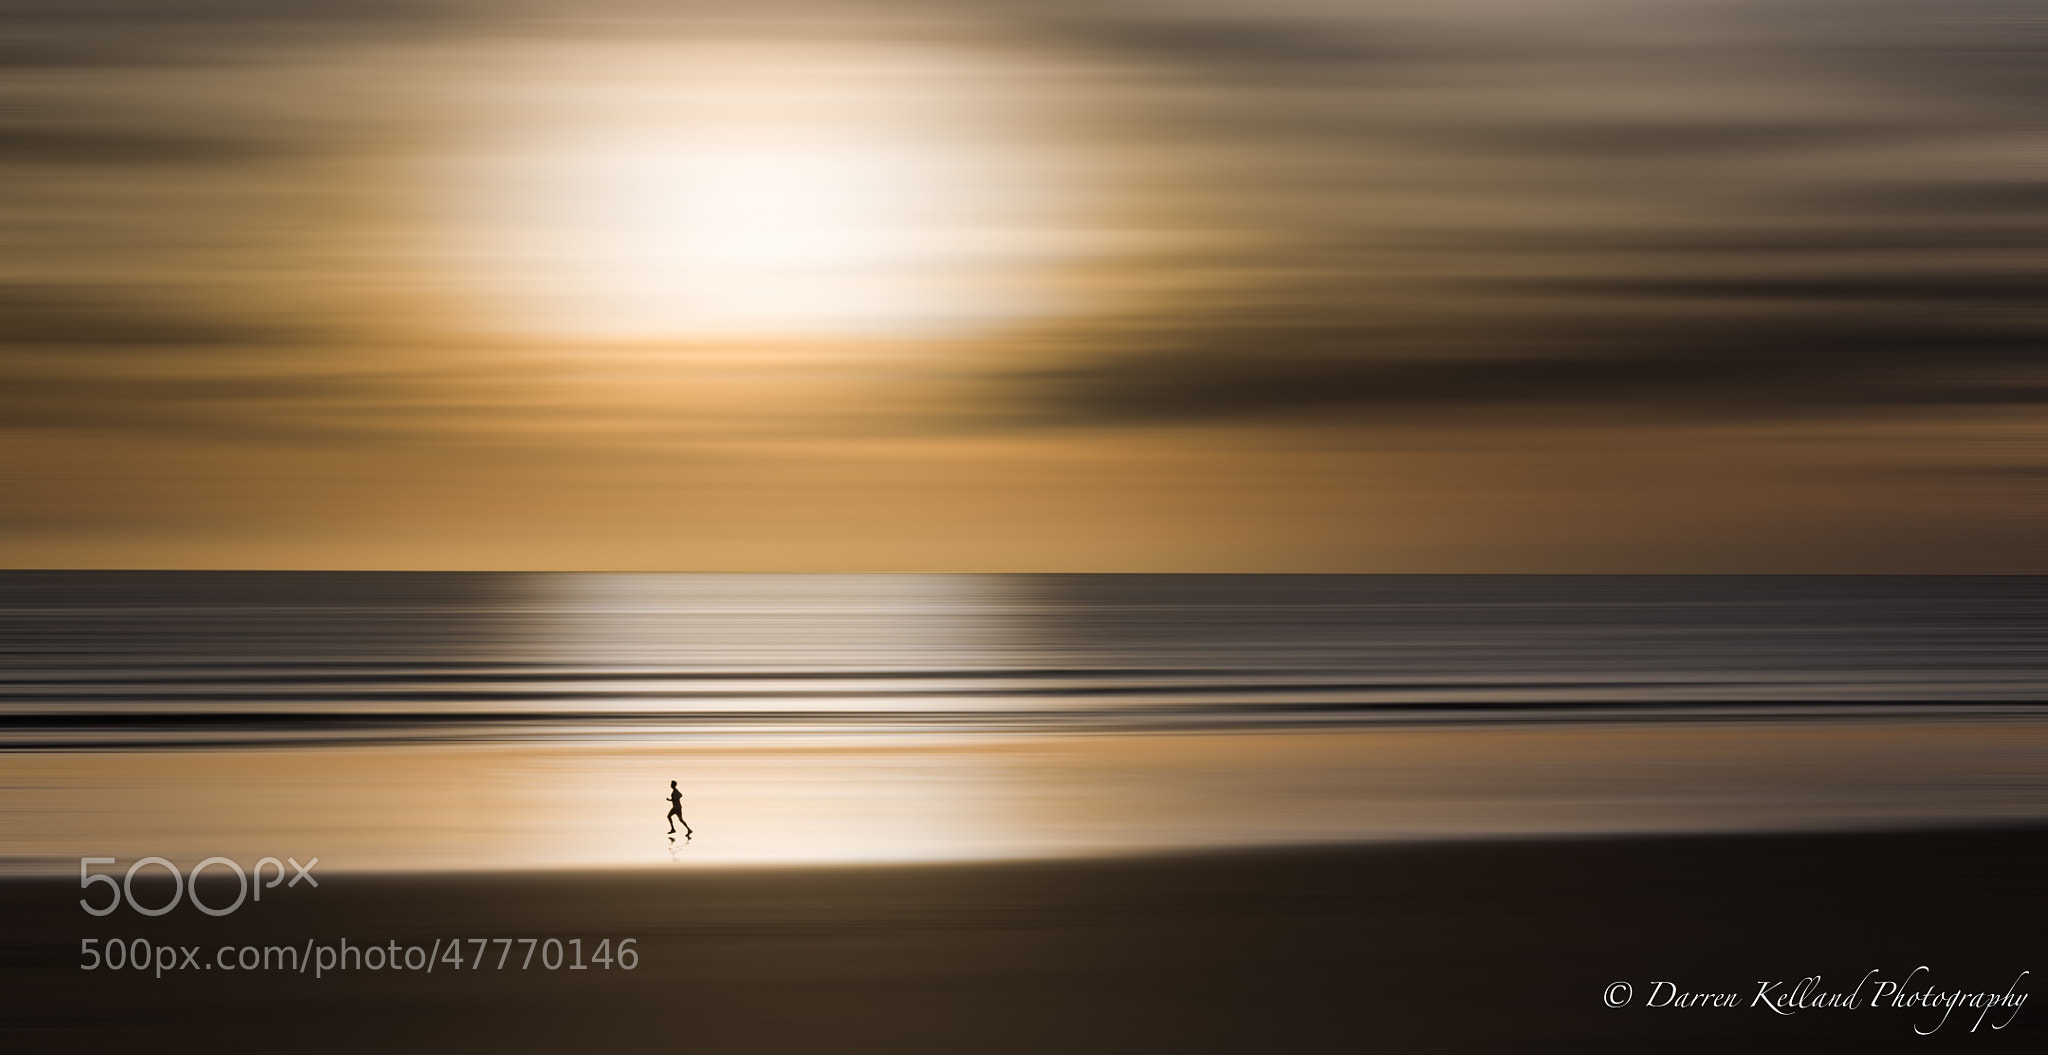 Photograph The Running Man by Darren Kelland on 500px